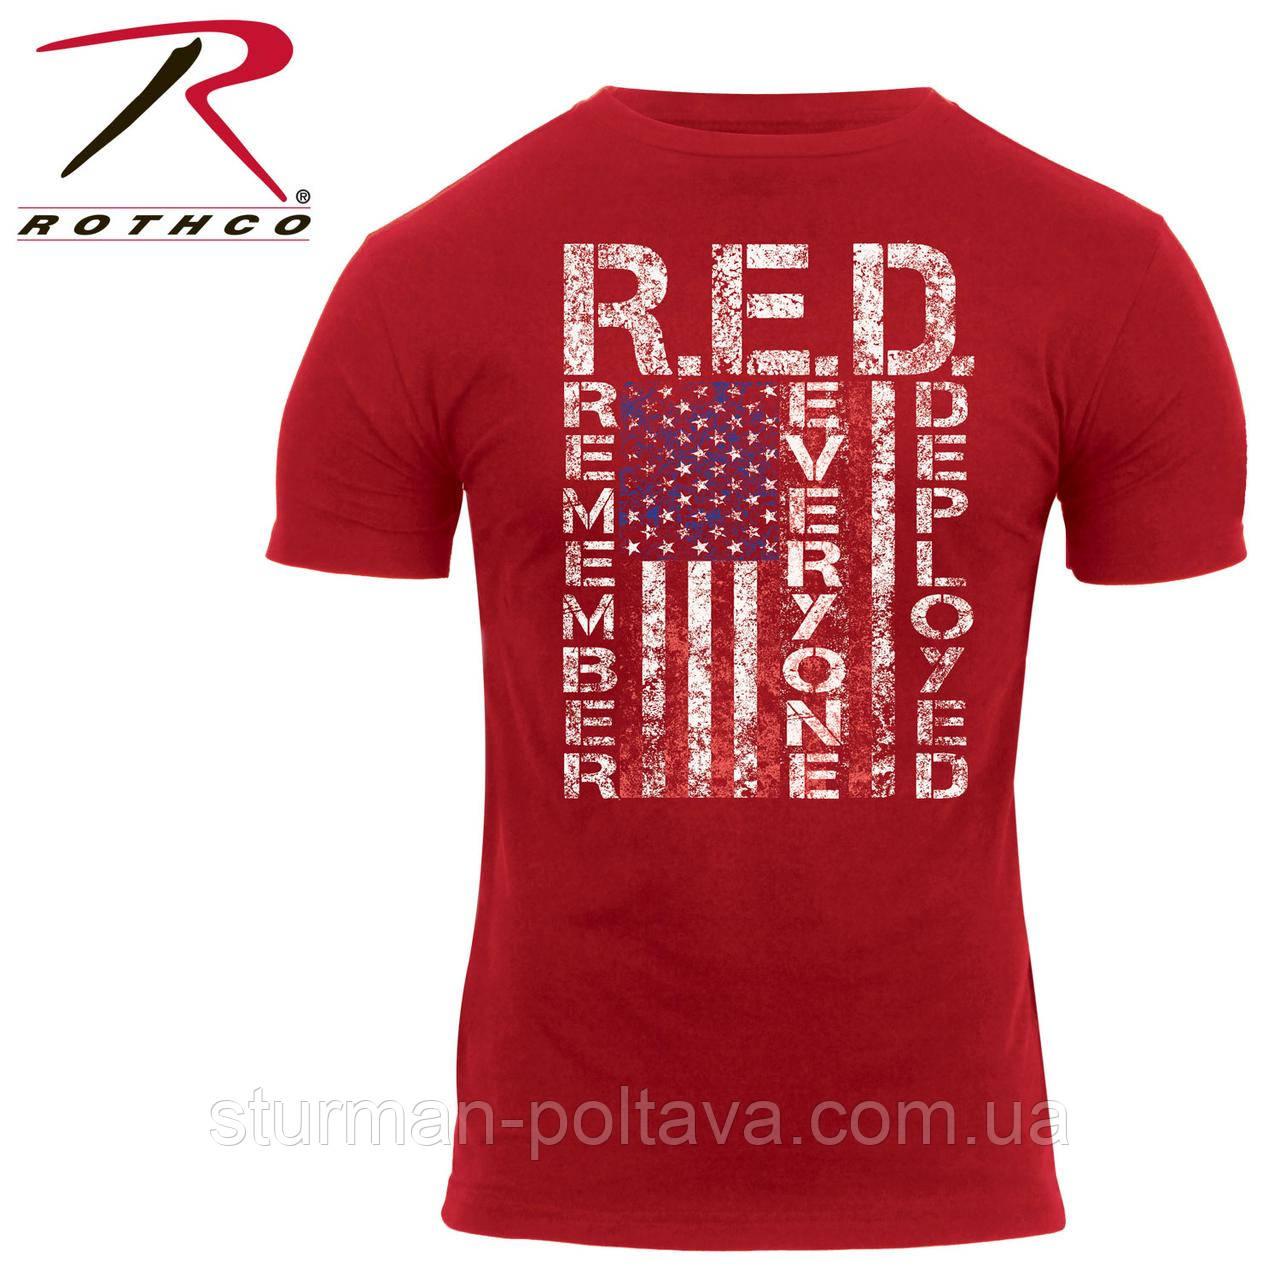 Футболка Rothco с флагом США Athletic Fit R.E.D.